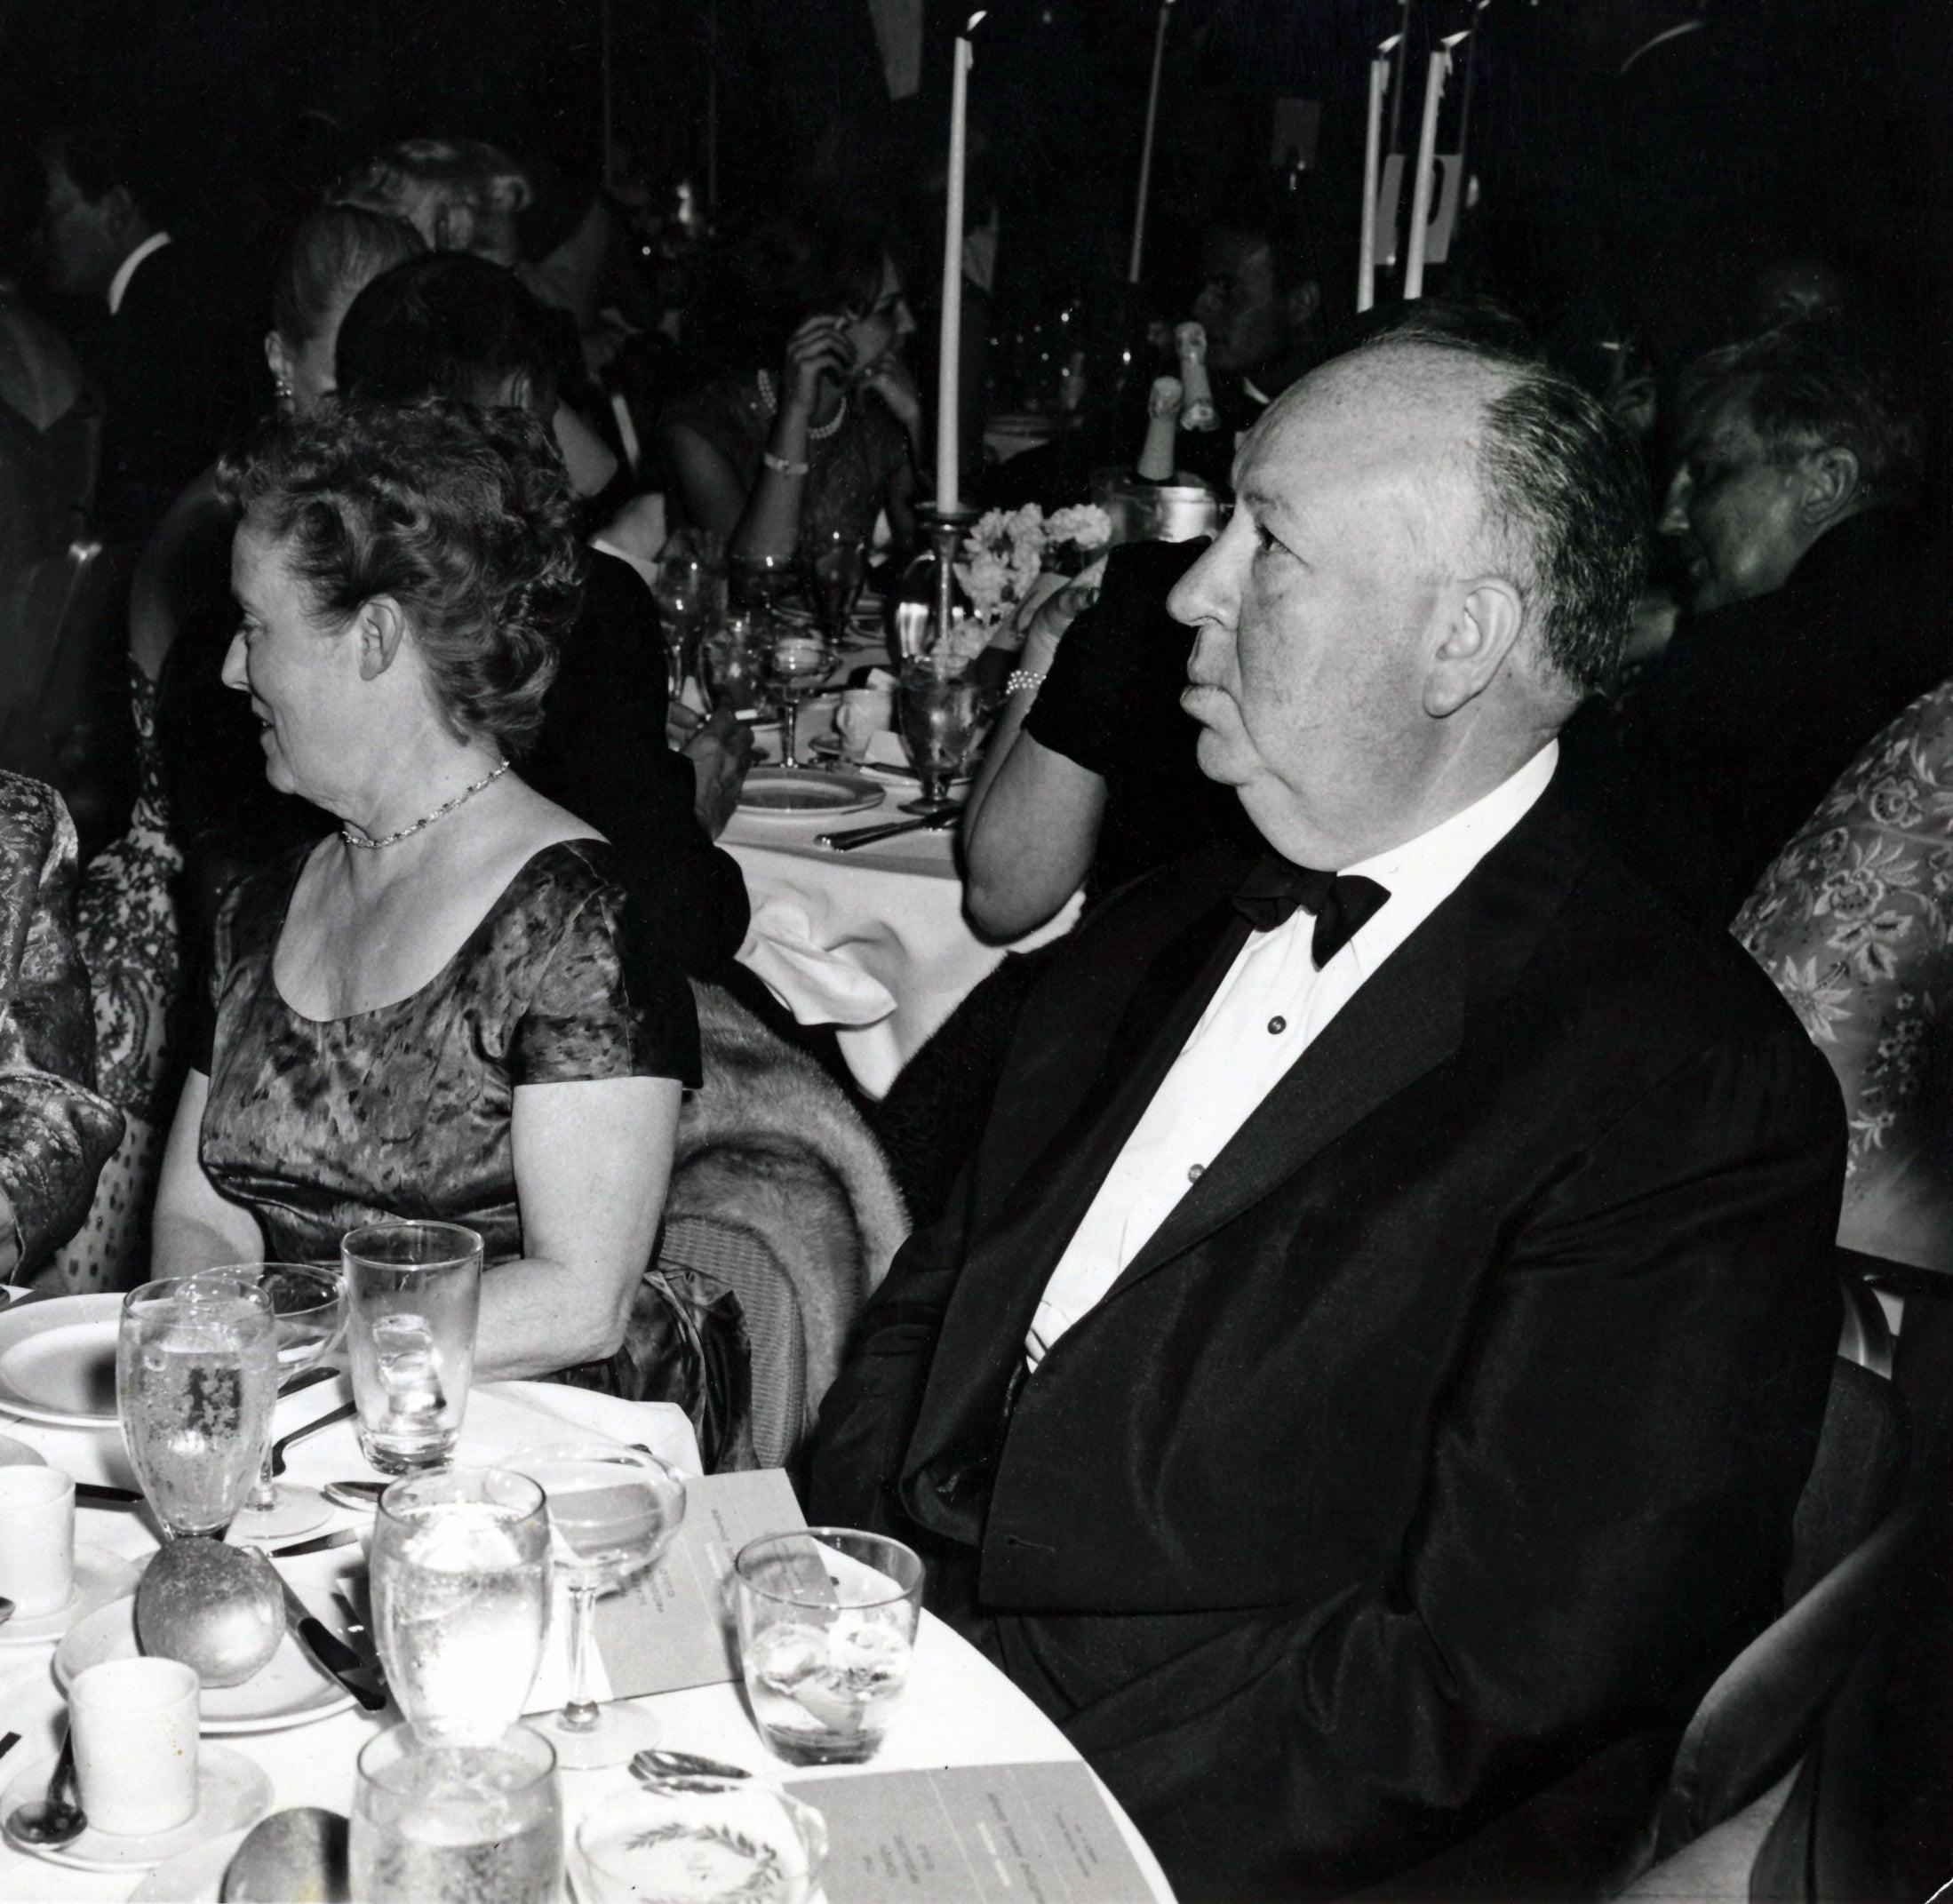 Filmmaker Alfred Hitchcock at the Golden Globes, 1960s